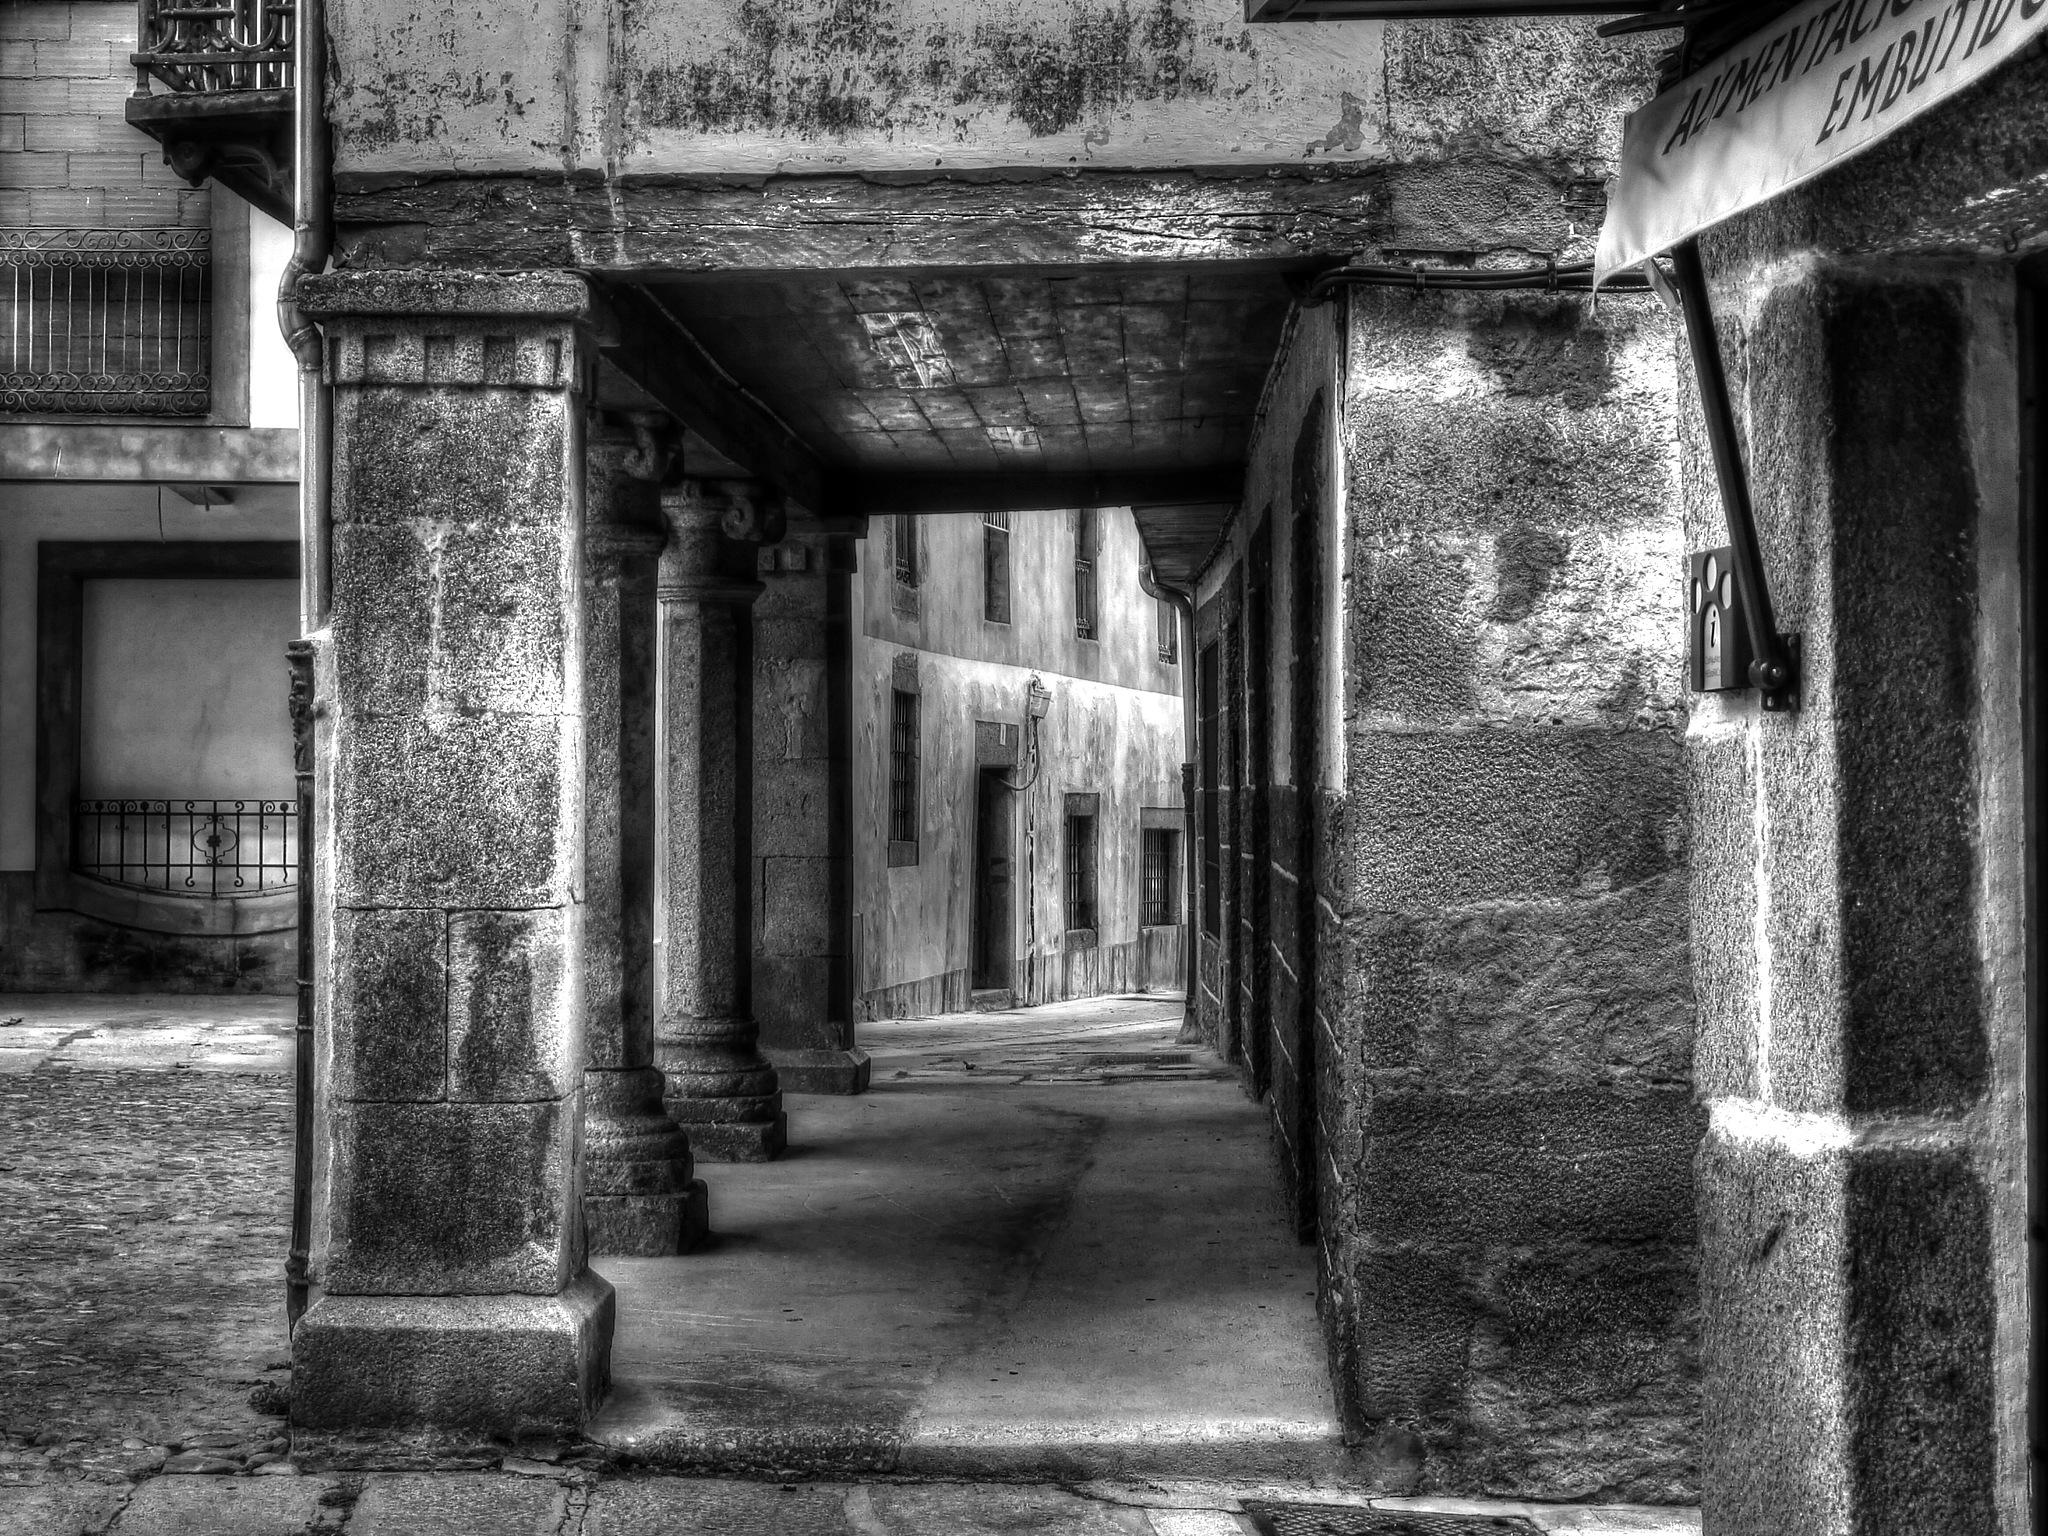 In Old Ledesma #2 by SteveR